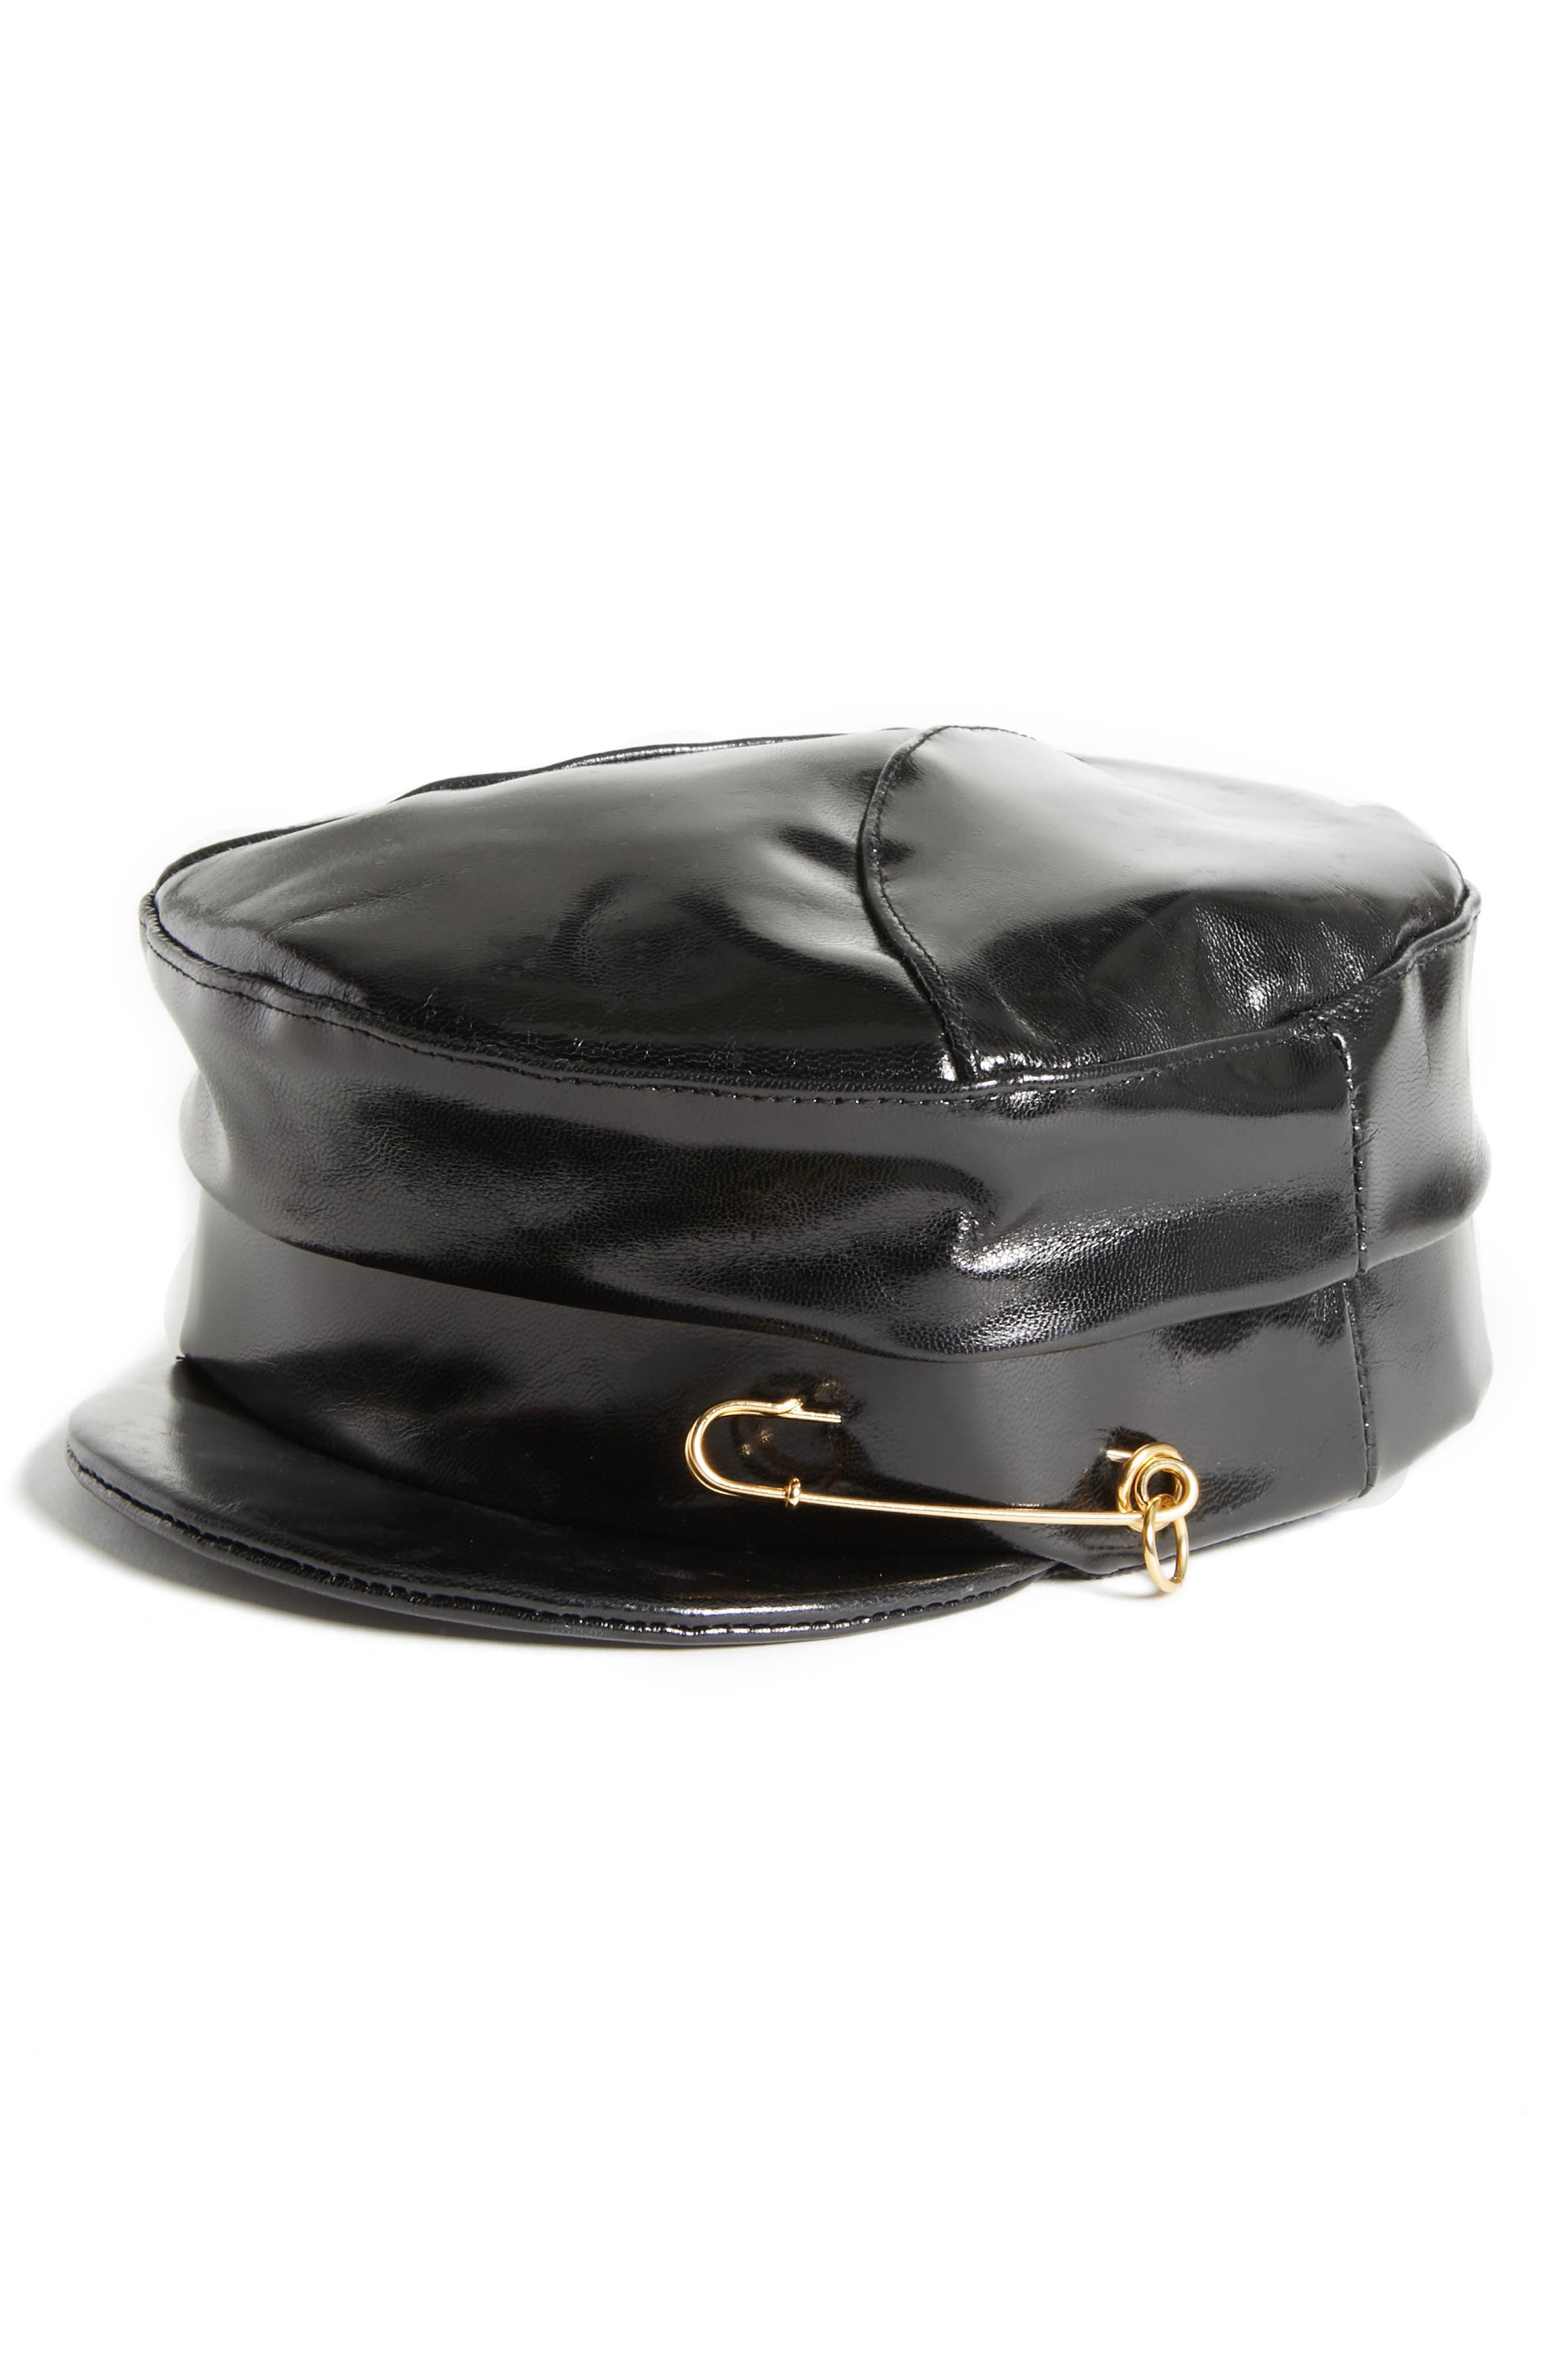 GIGI BURRIS MILLINERY GEORGIE MILITARY CAP - BLACK